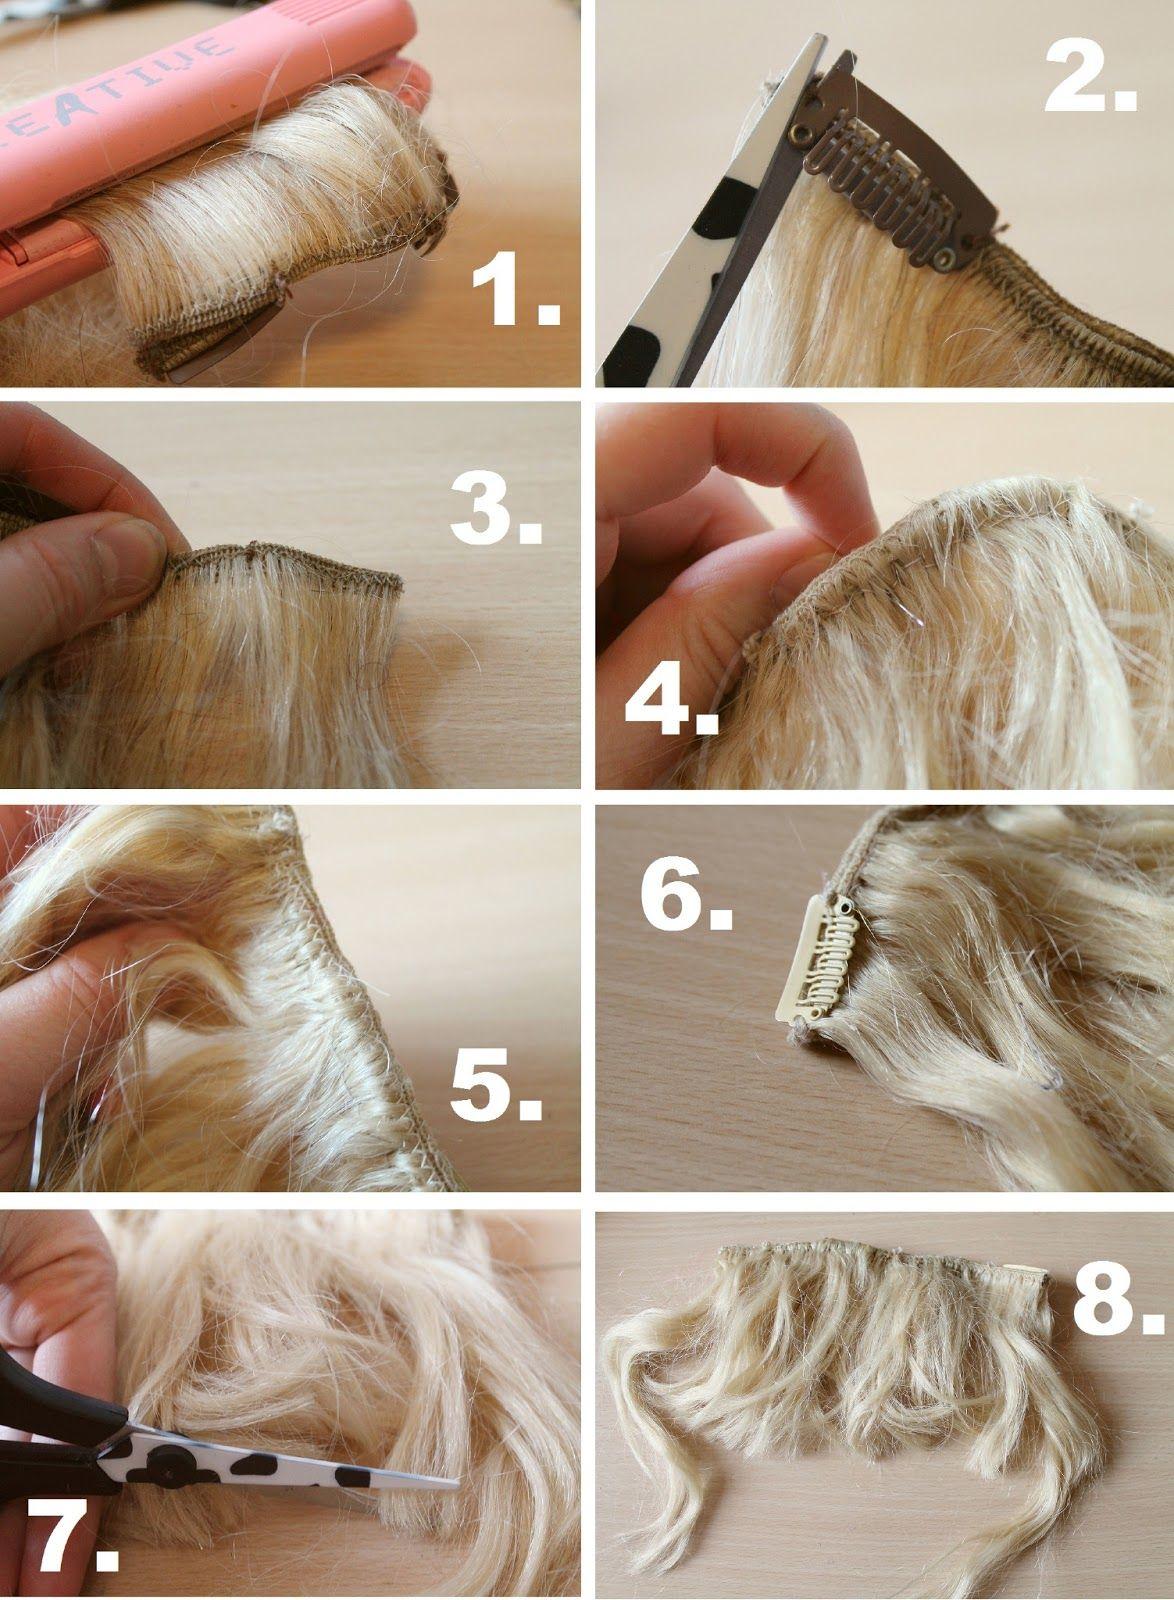 Diy Clip In Bangs Guest Post Diy Hair Extension Clips Hair Extension Clips Diy Hair Extensions